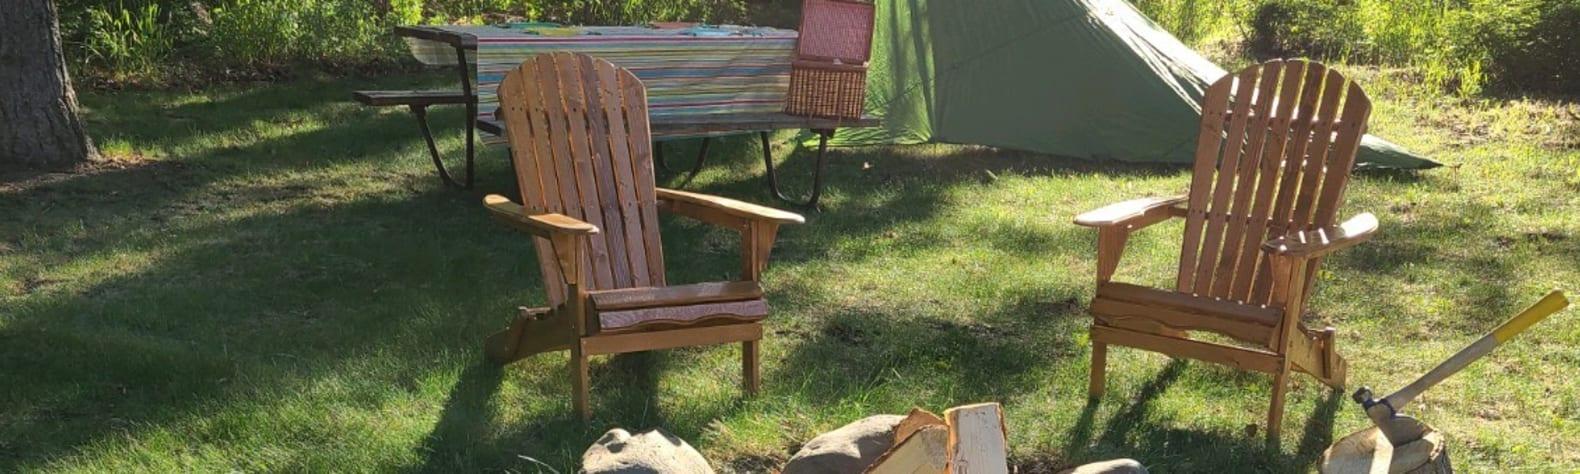 Eagle Rock Resort Campground